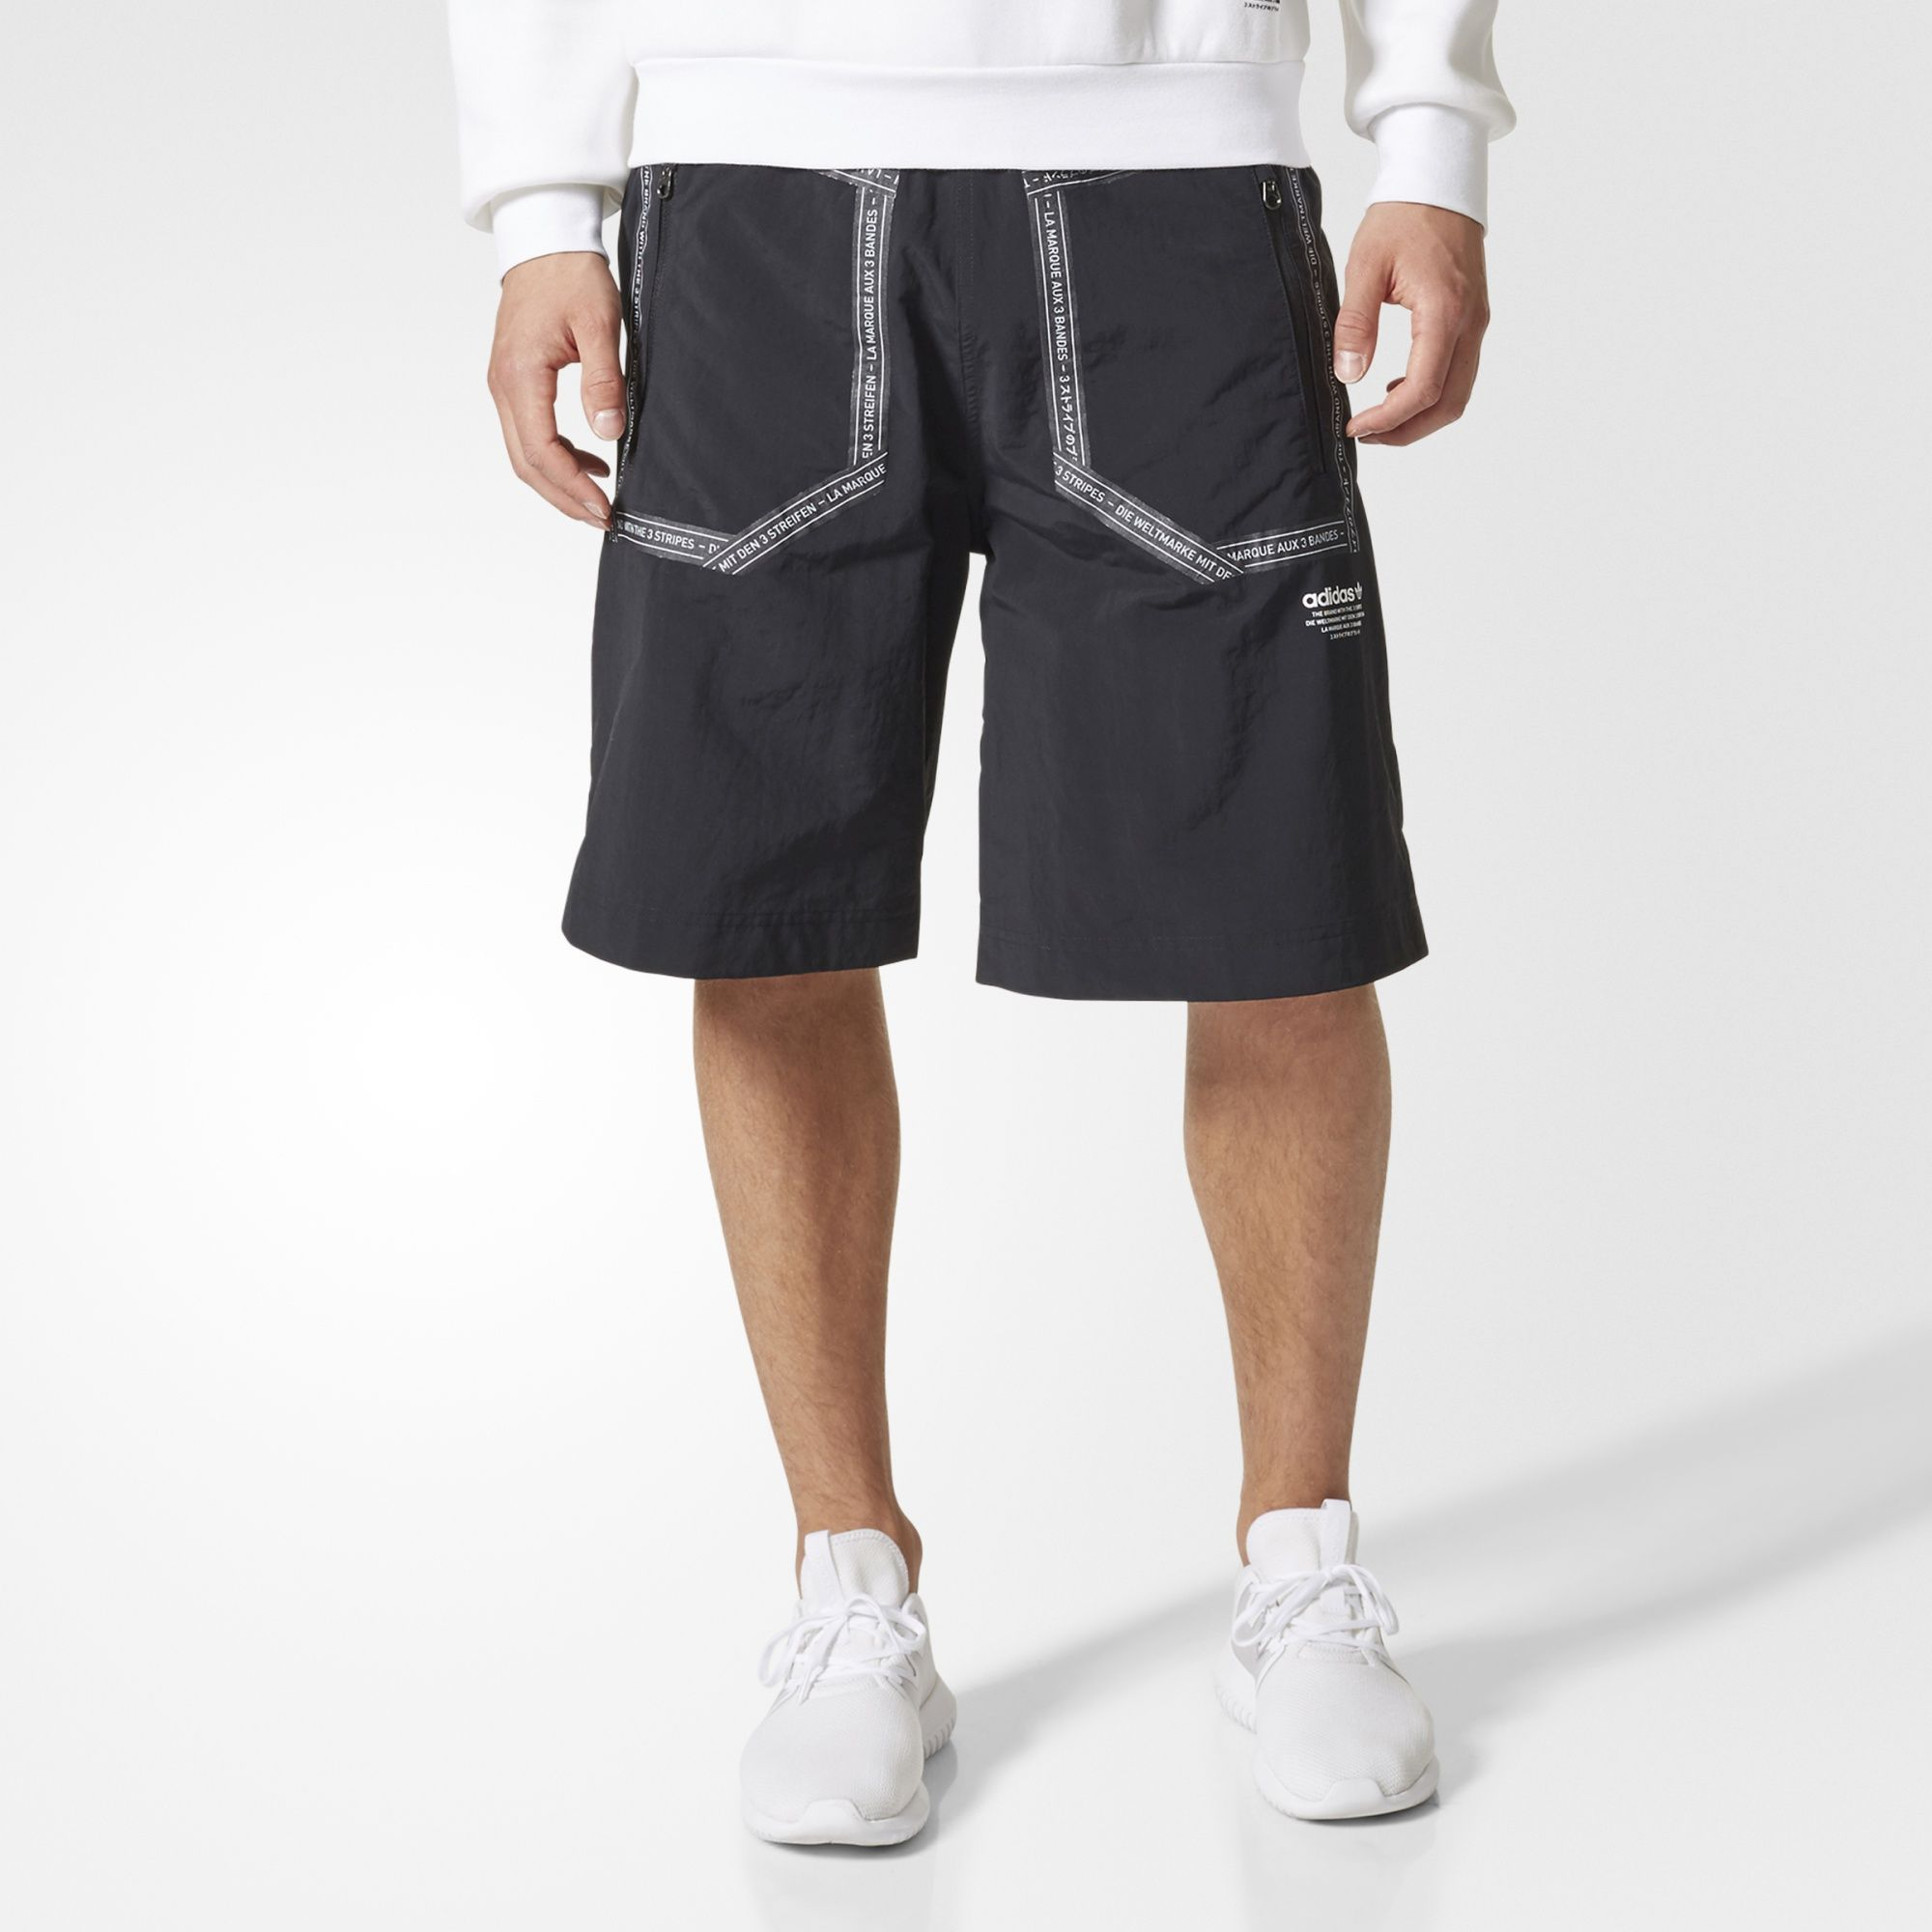 e2dbe3f6d26df adidas - Men s Reversible Shorts